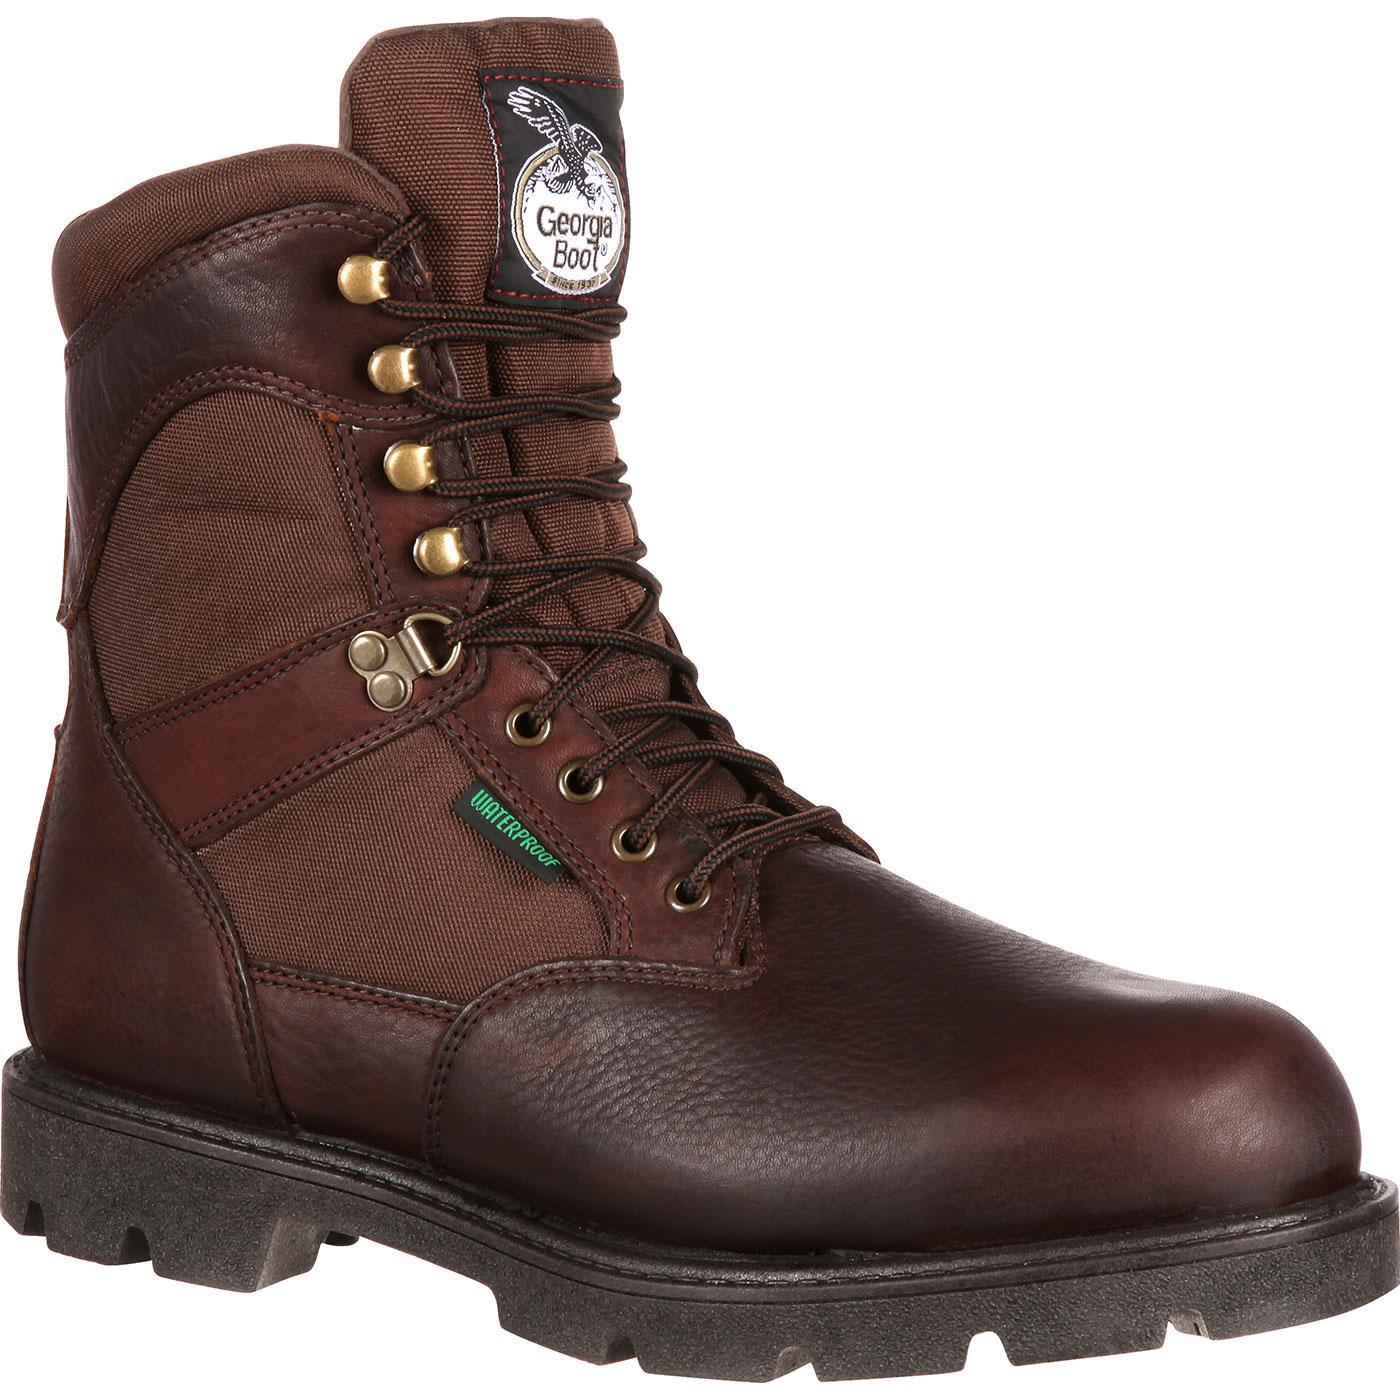 a11a697331a7 Georgia Boot Homeland Waterproof Insulated Work Boot